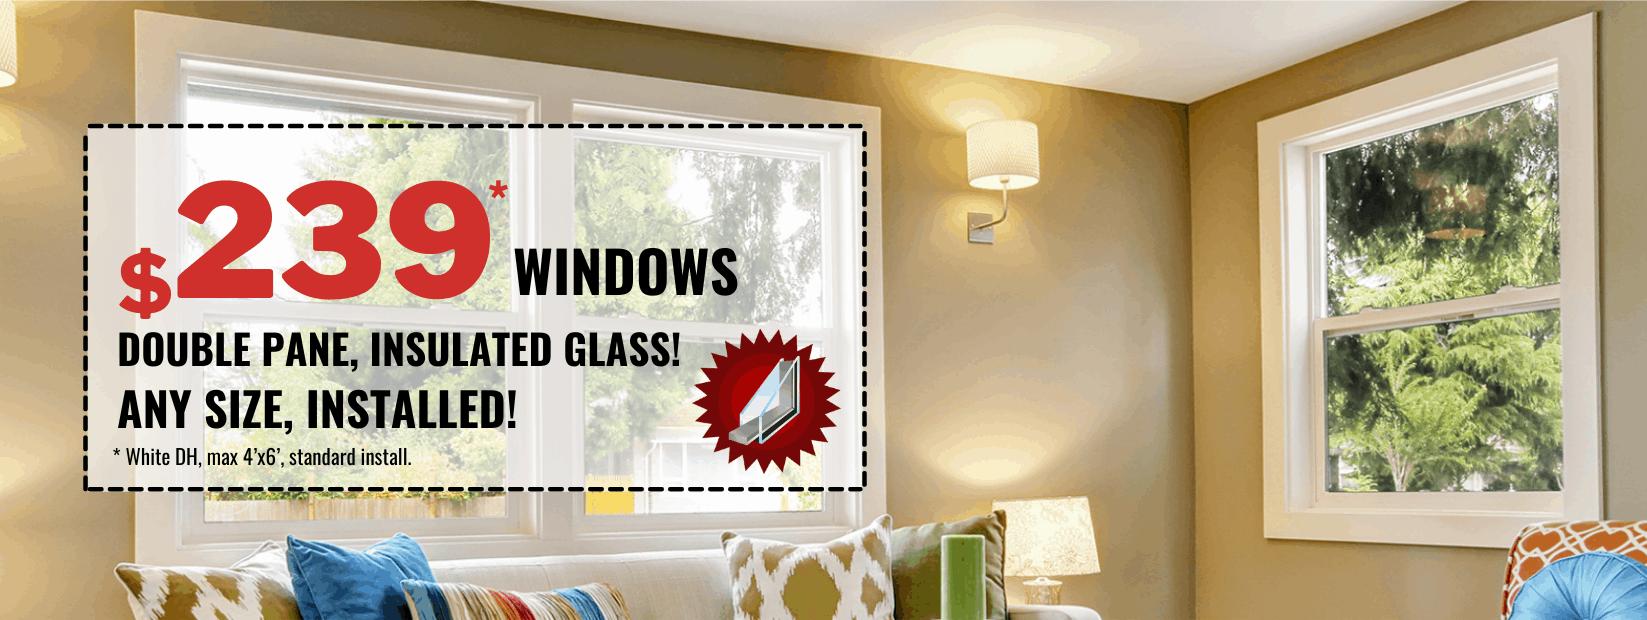 Double Pane Insulated Glass Windows